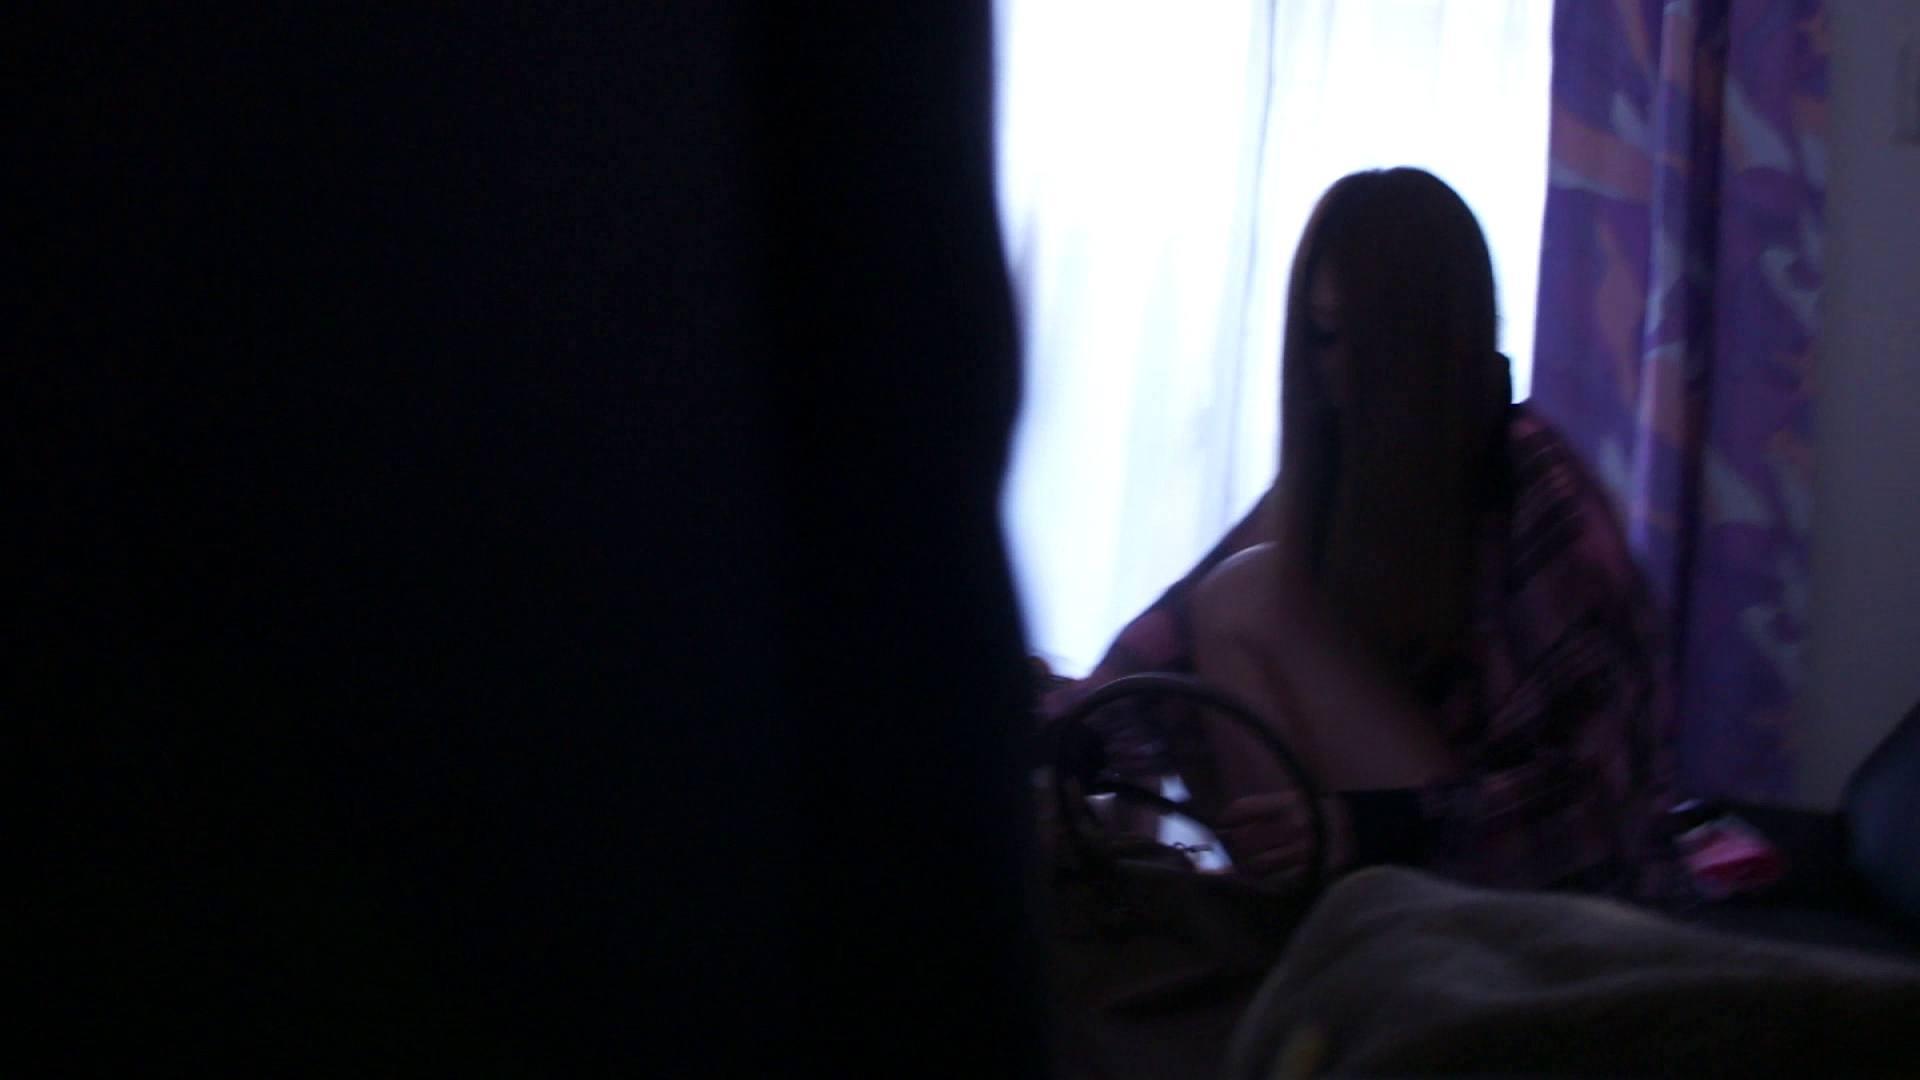 episode1 ヒロトさんと保険外交員との顔合わせ 寝取り・他人棒  106pic 20